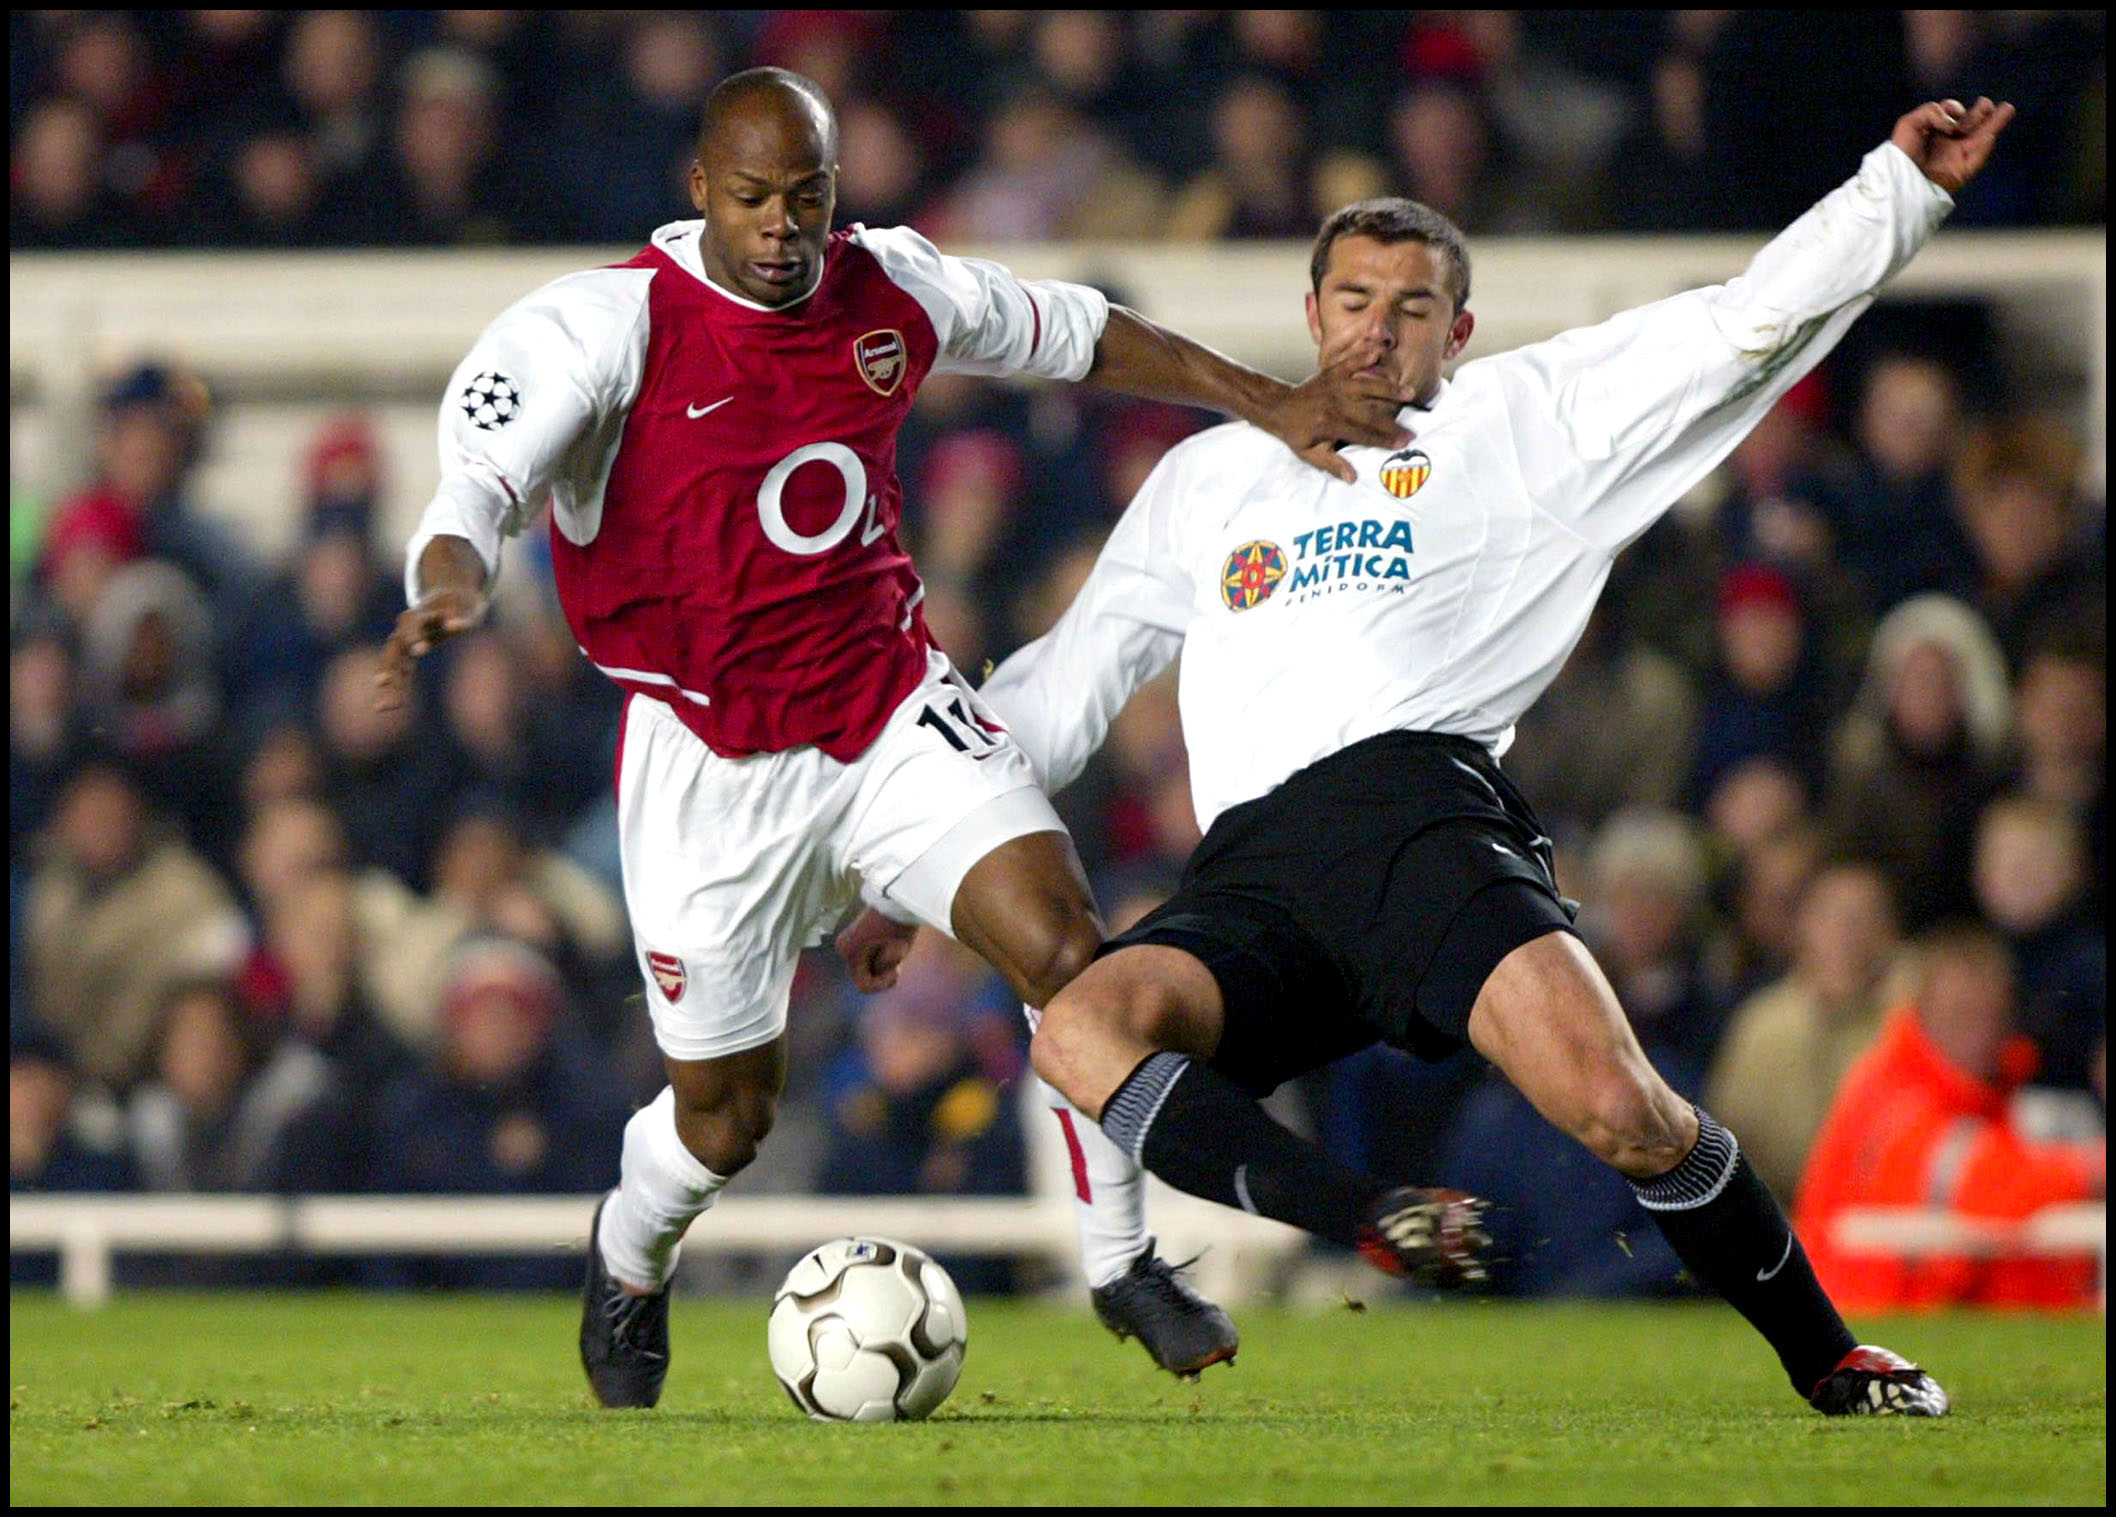 Wiltord, en un Arsenal-Valencia de Champions disputado en diciembre de 2002 (GTRES).